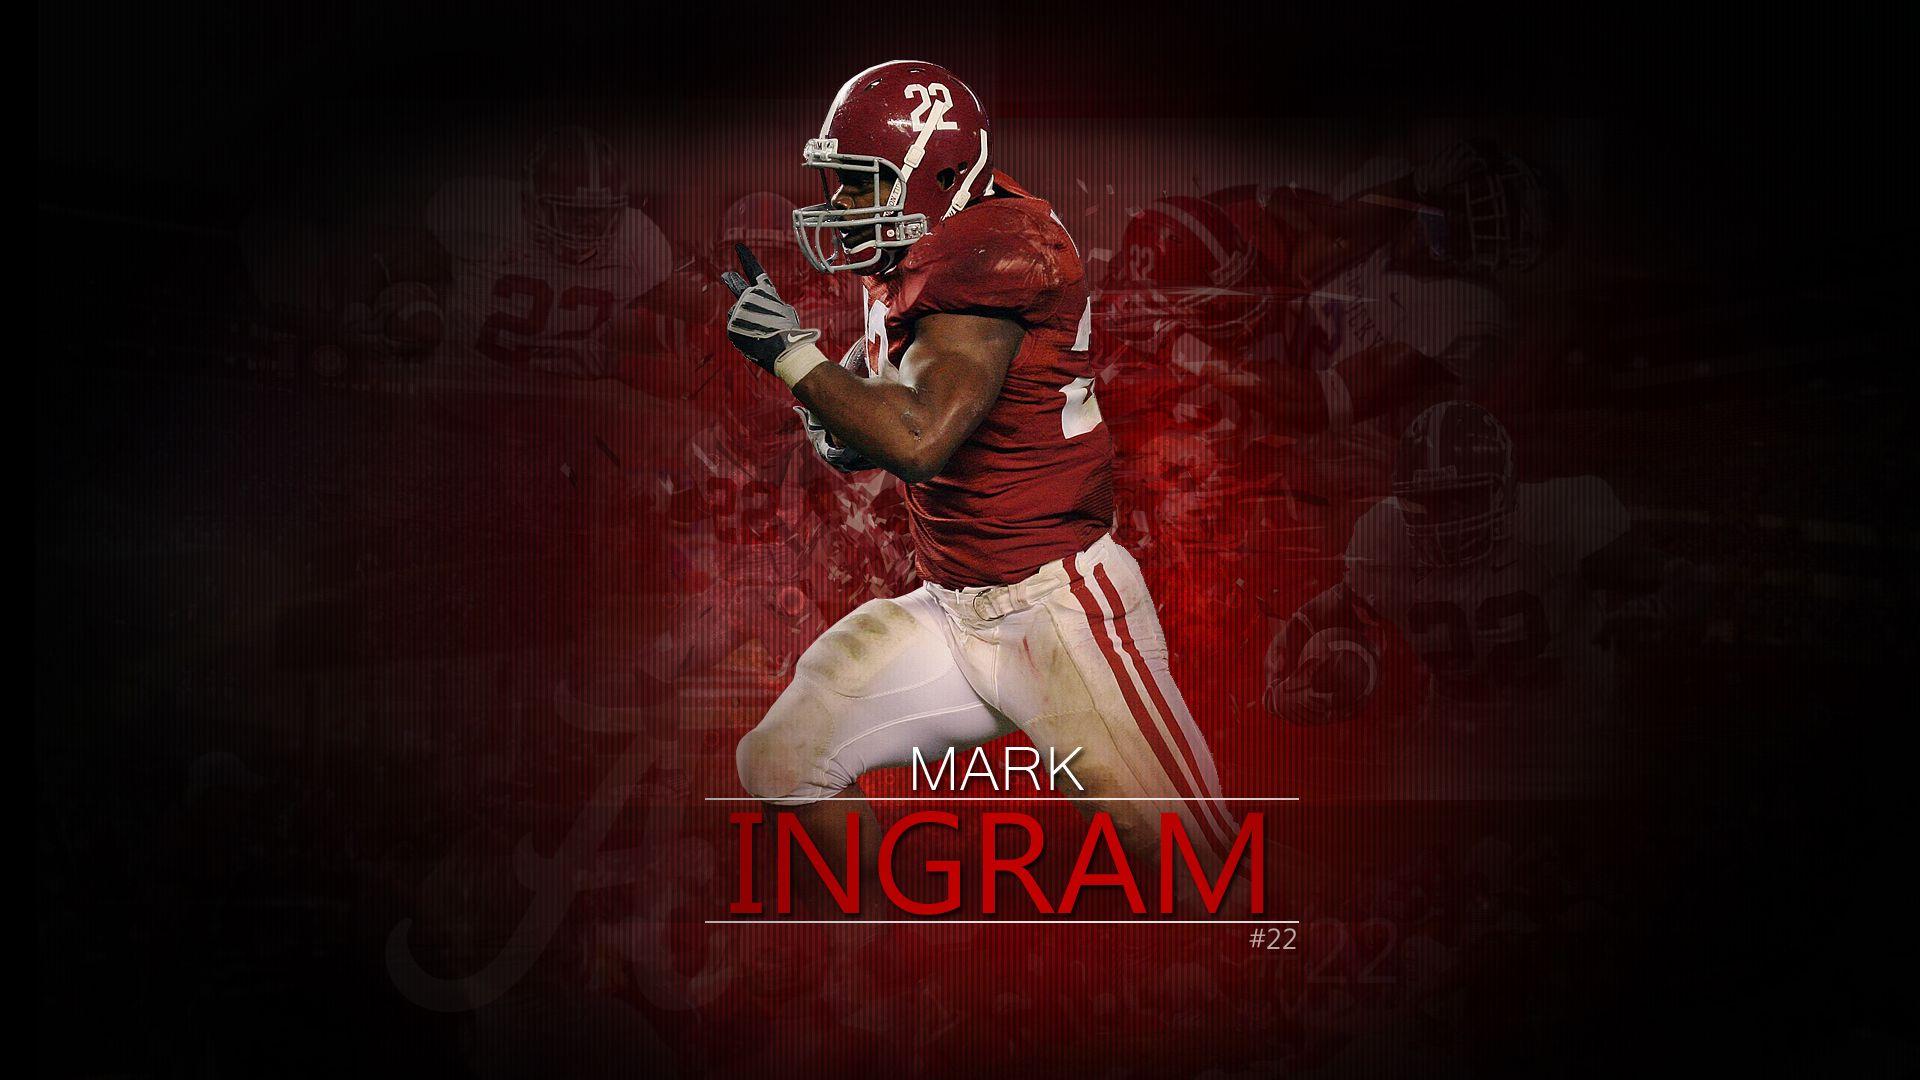 Mark Ingram Yea Alabama Yall Ready To Rolllll Tide Football 1920x1080